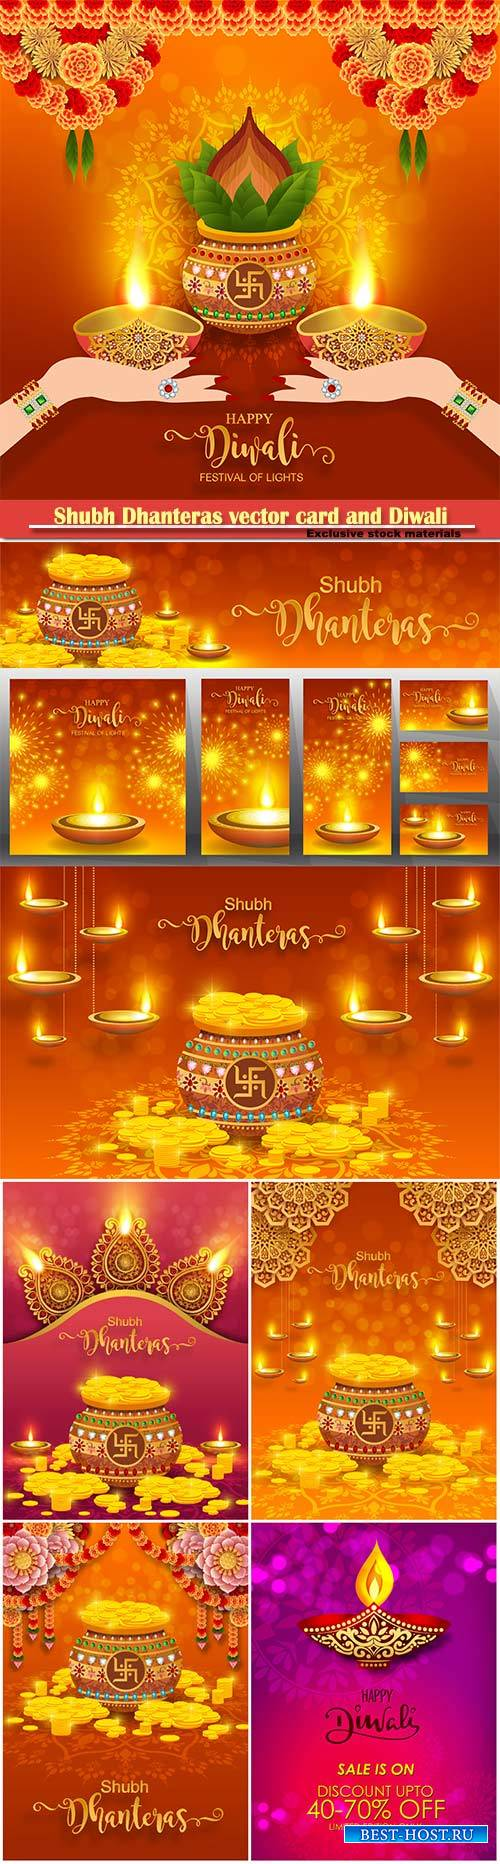 Shubh Dhanteras festival vector card and Diwali vector design